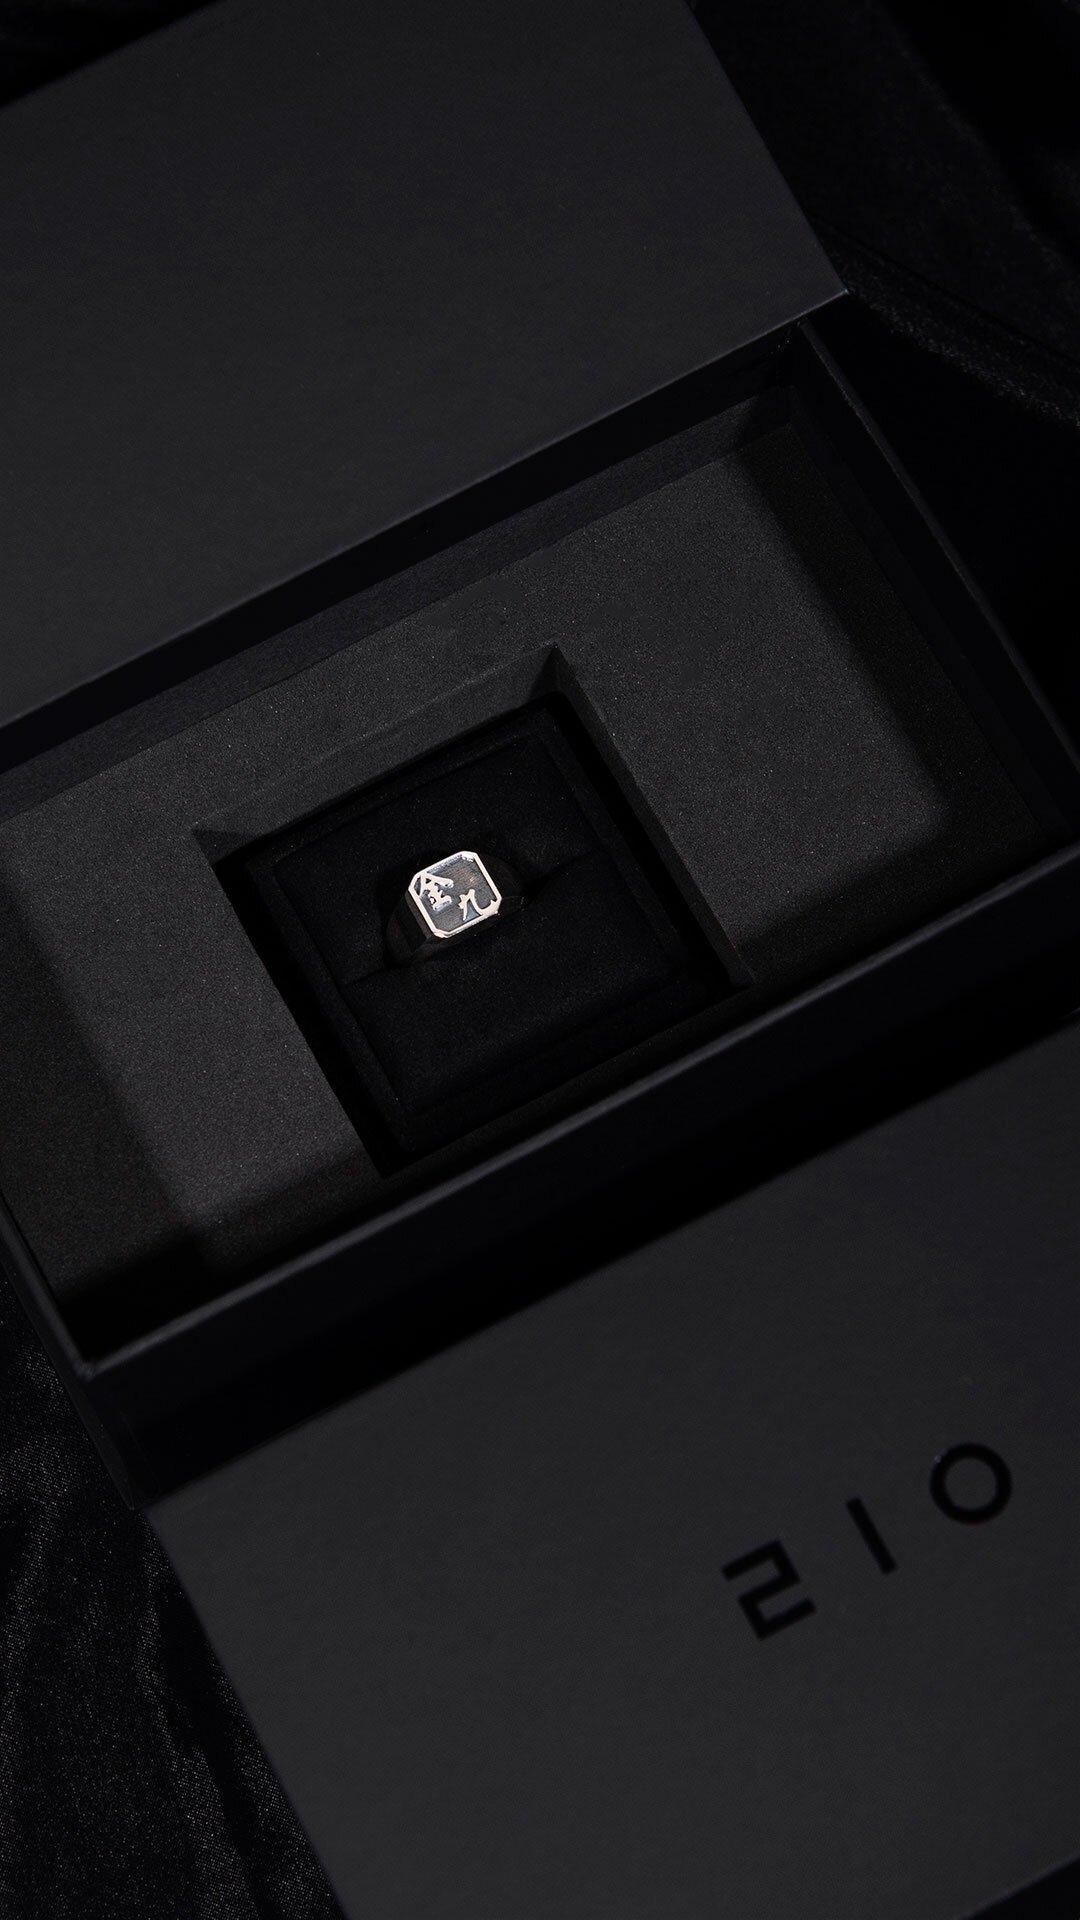 1ING[일링] 옥타곤 원링(각인) 은(Silver) 소재 컨셉 사진 3